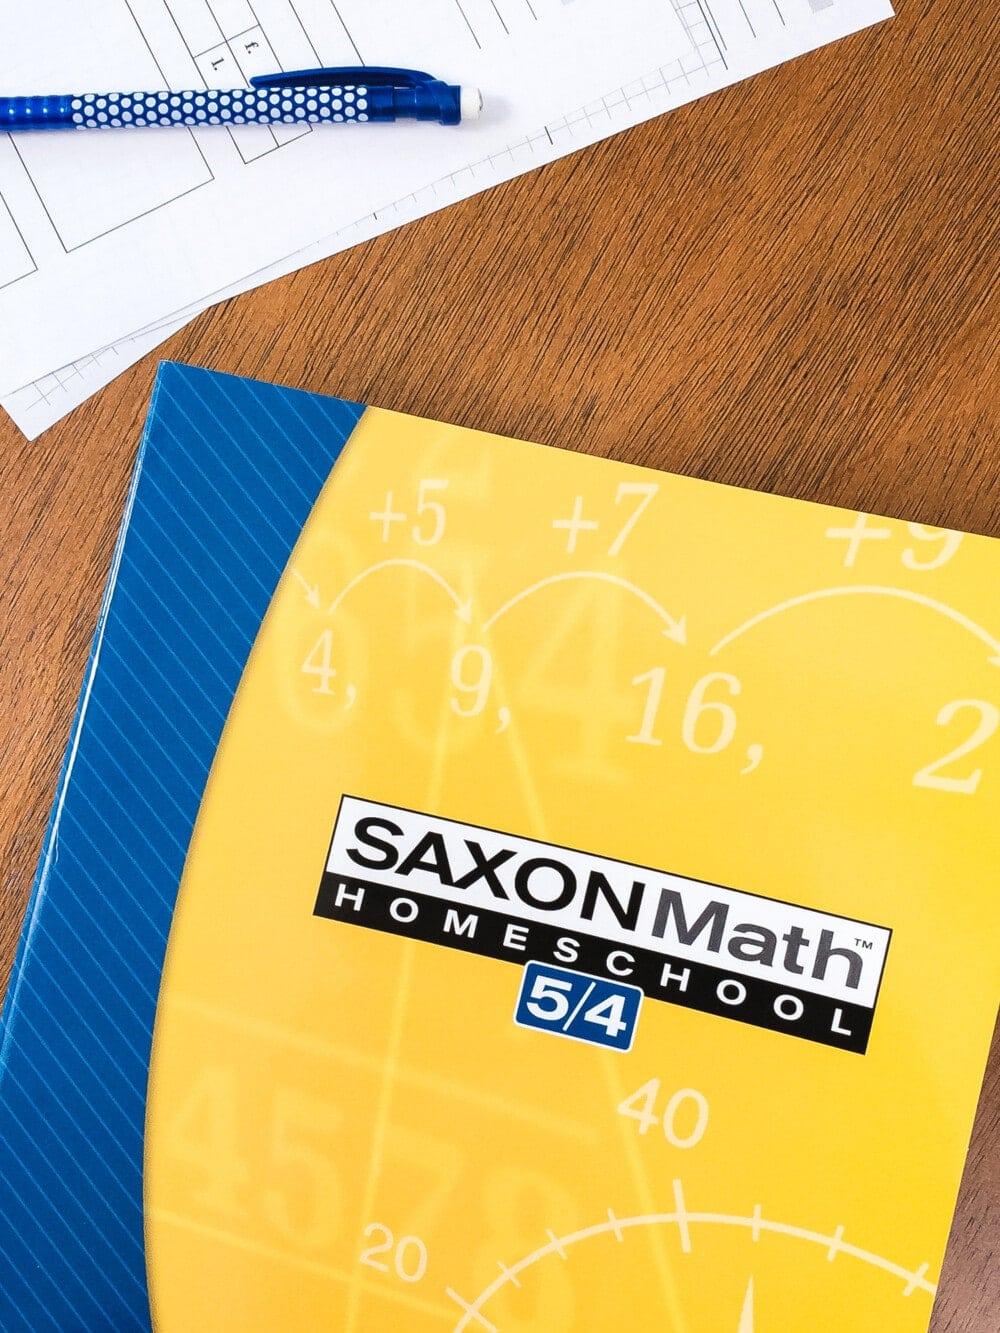 the saxon math 5/4 homeschool curriculum student workbook